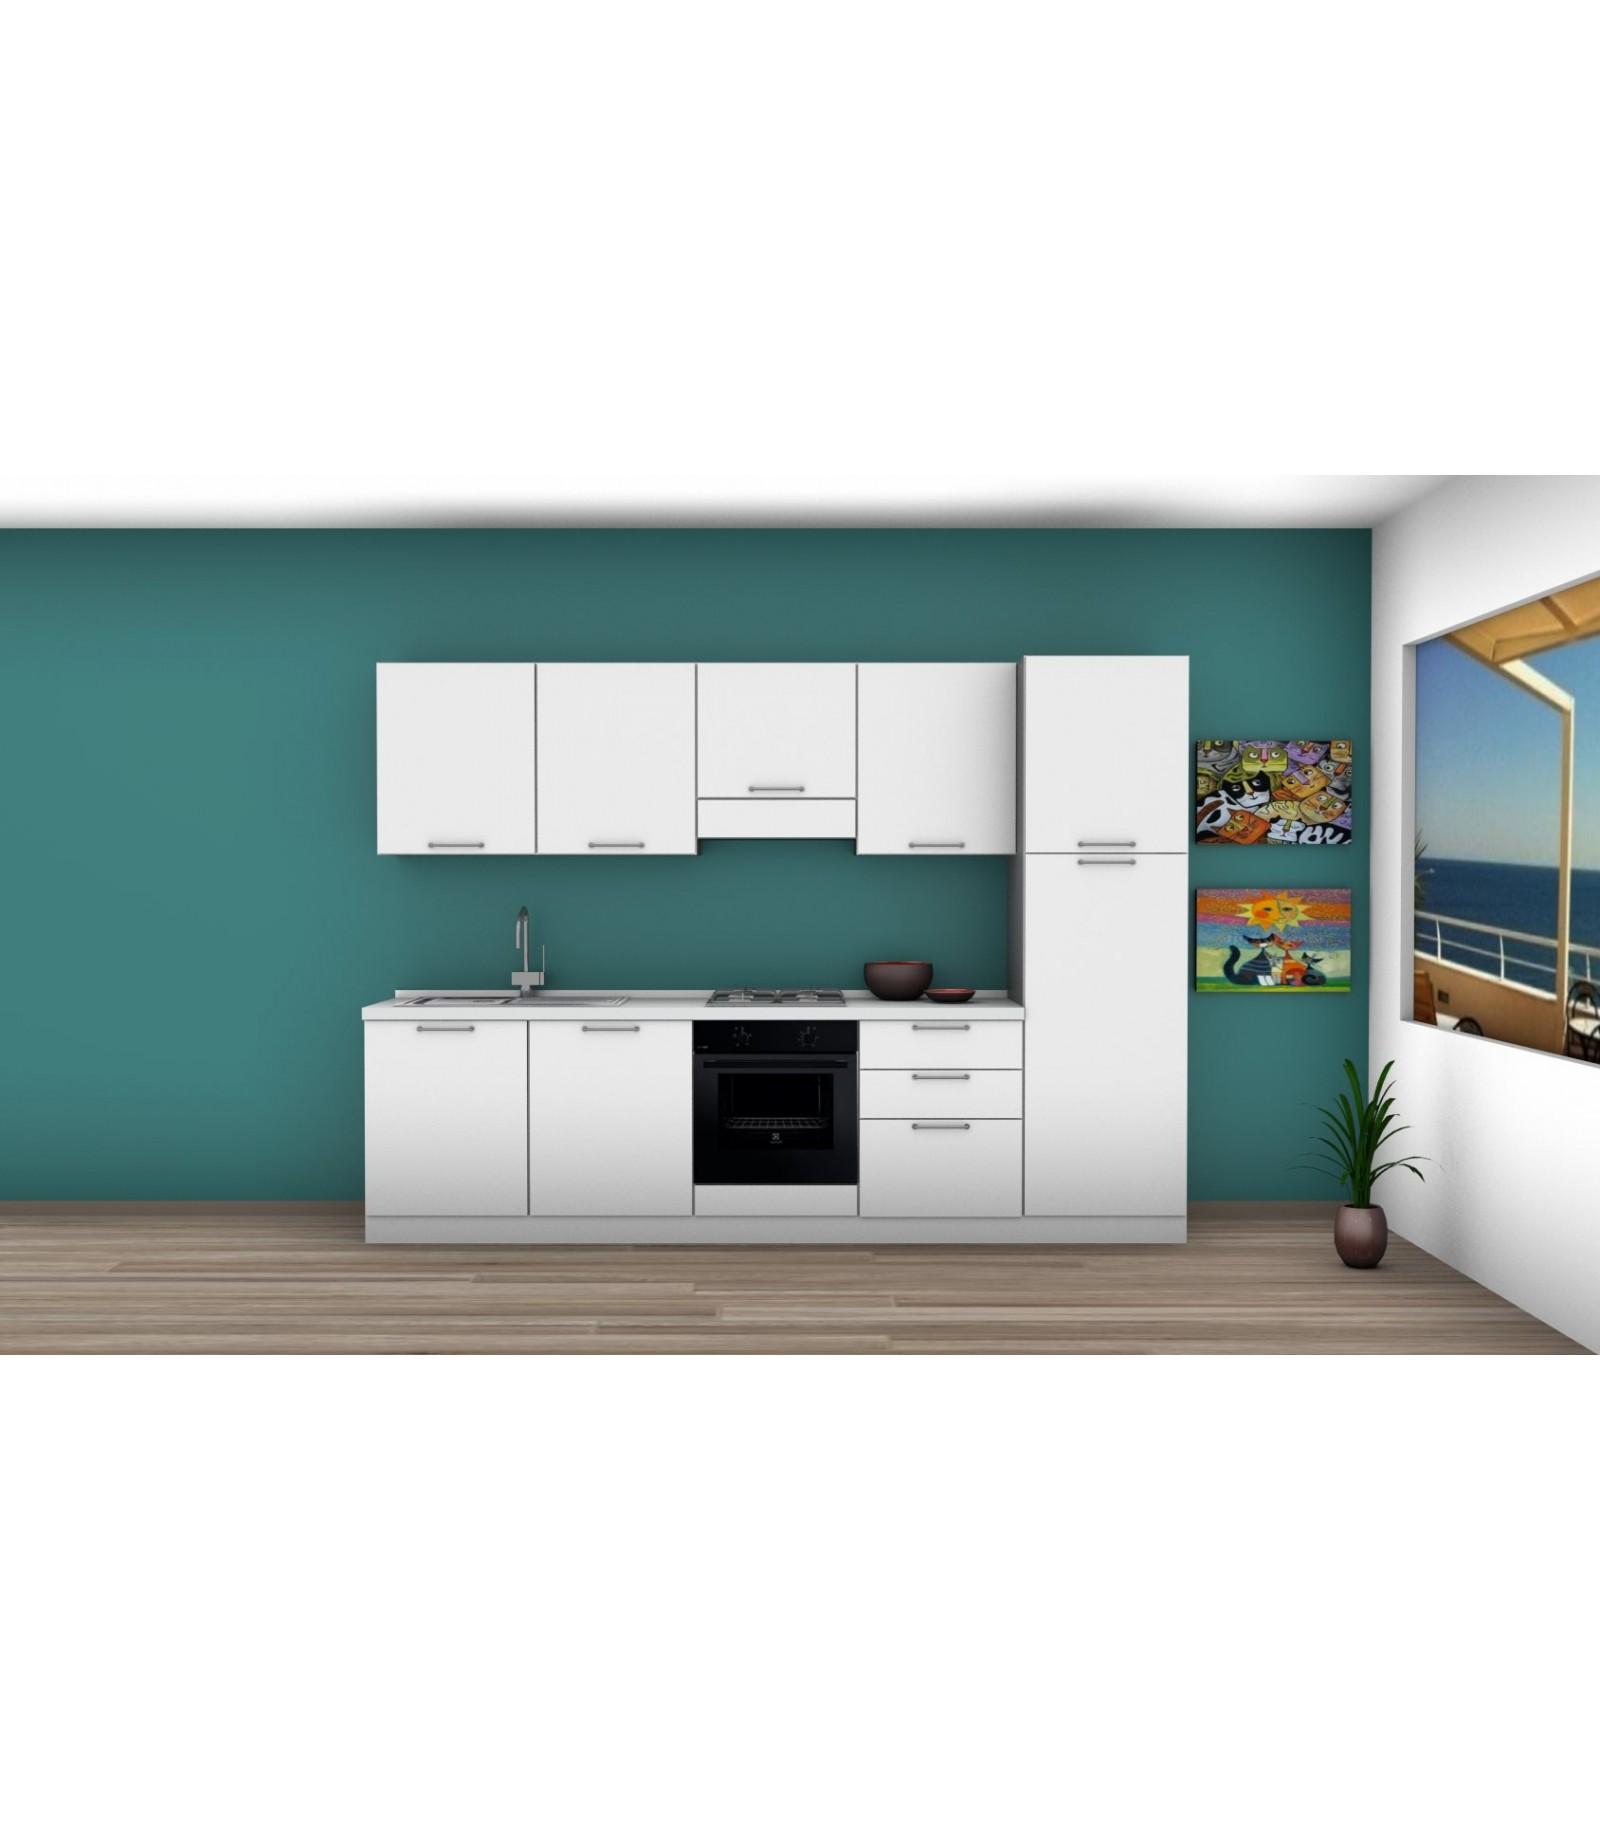 Cucina 07 lunghezza 300 cm mariotti casa for Gartenpool 300 cm